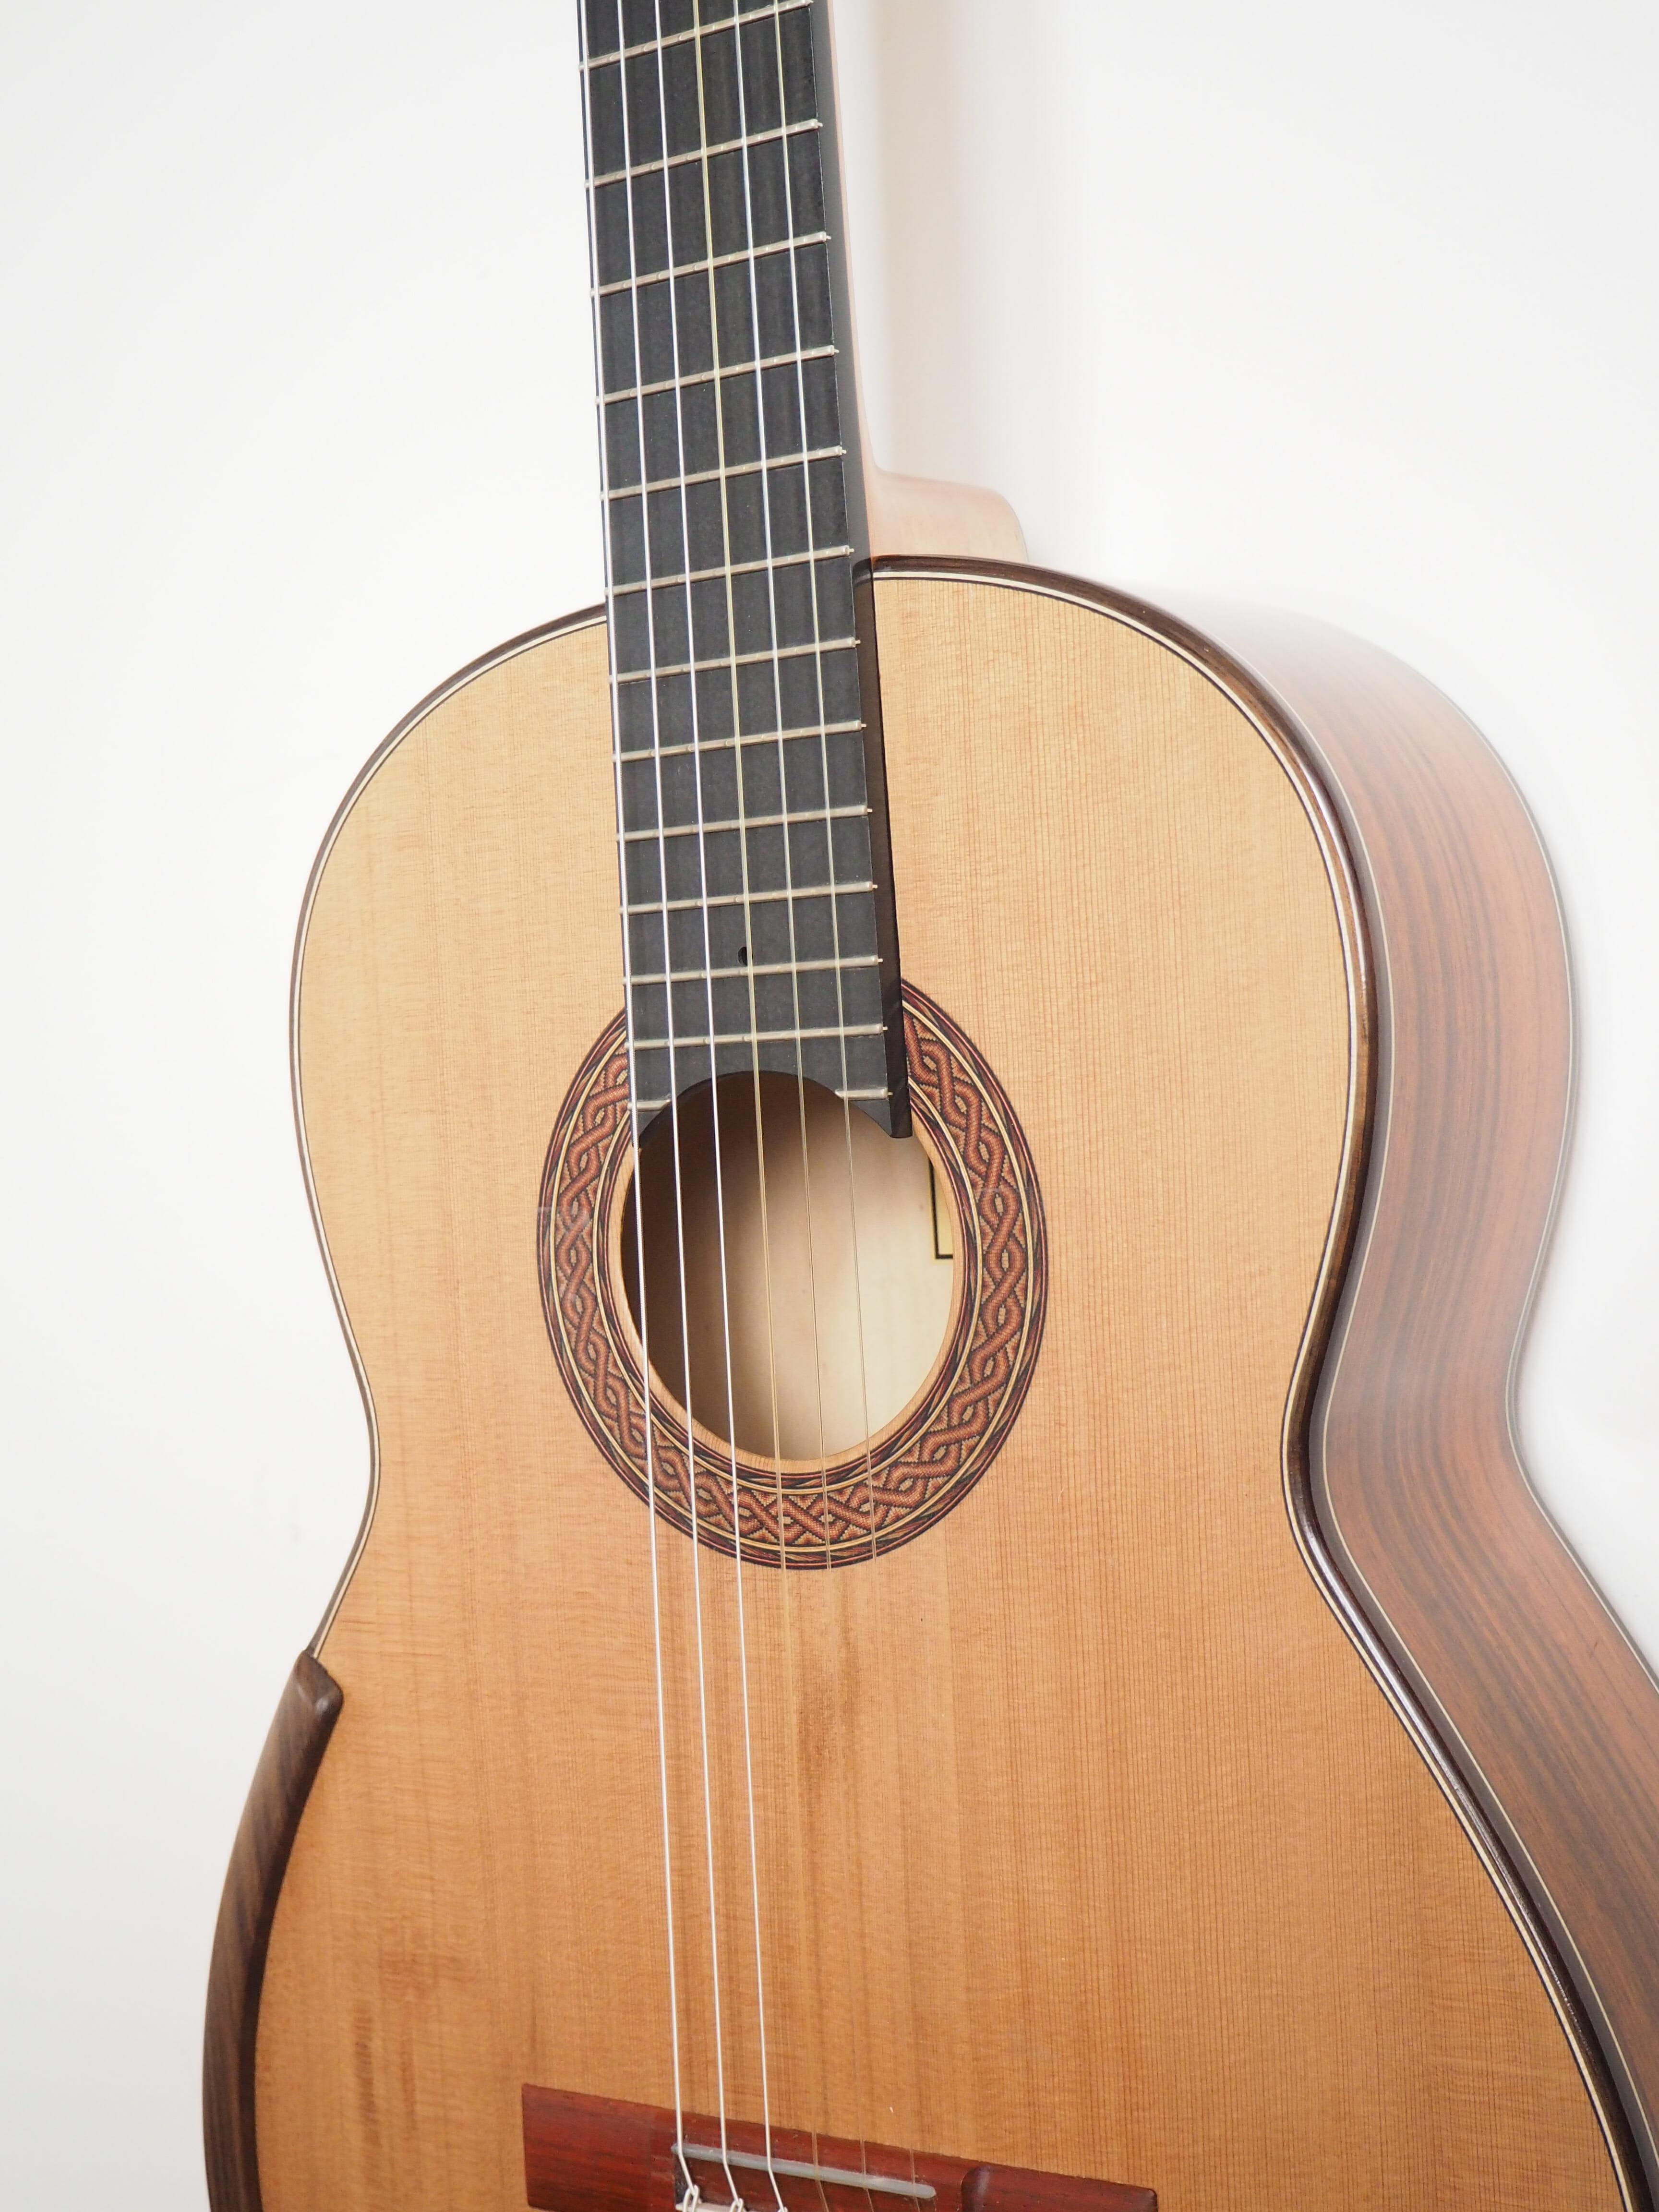 Greg Smallman guitare classique luthier lattice 201